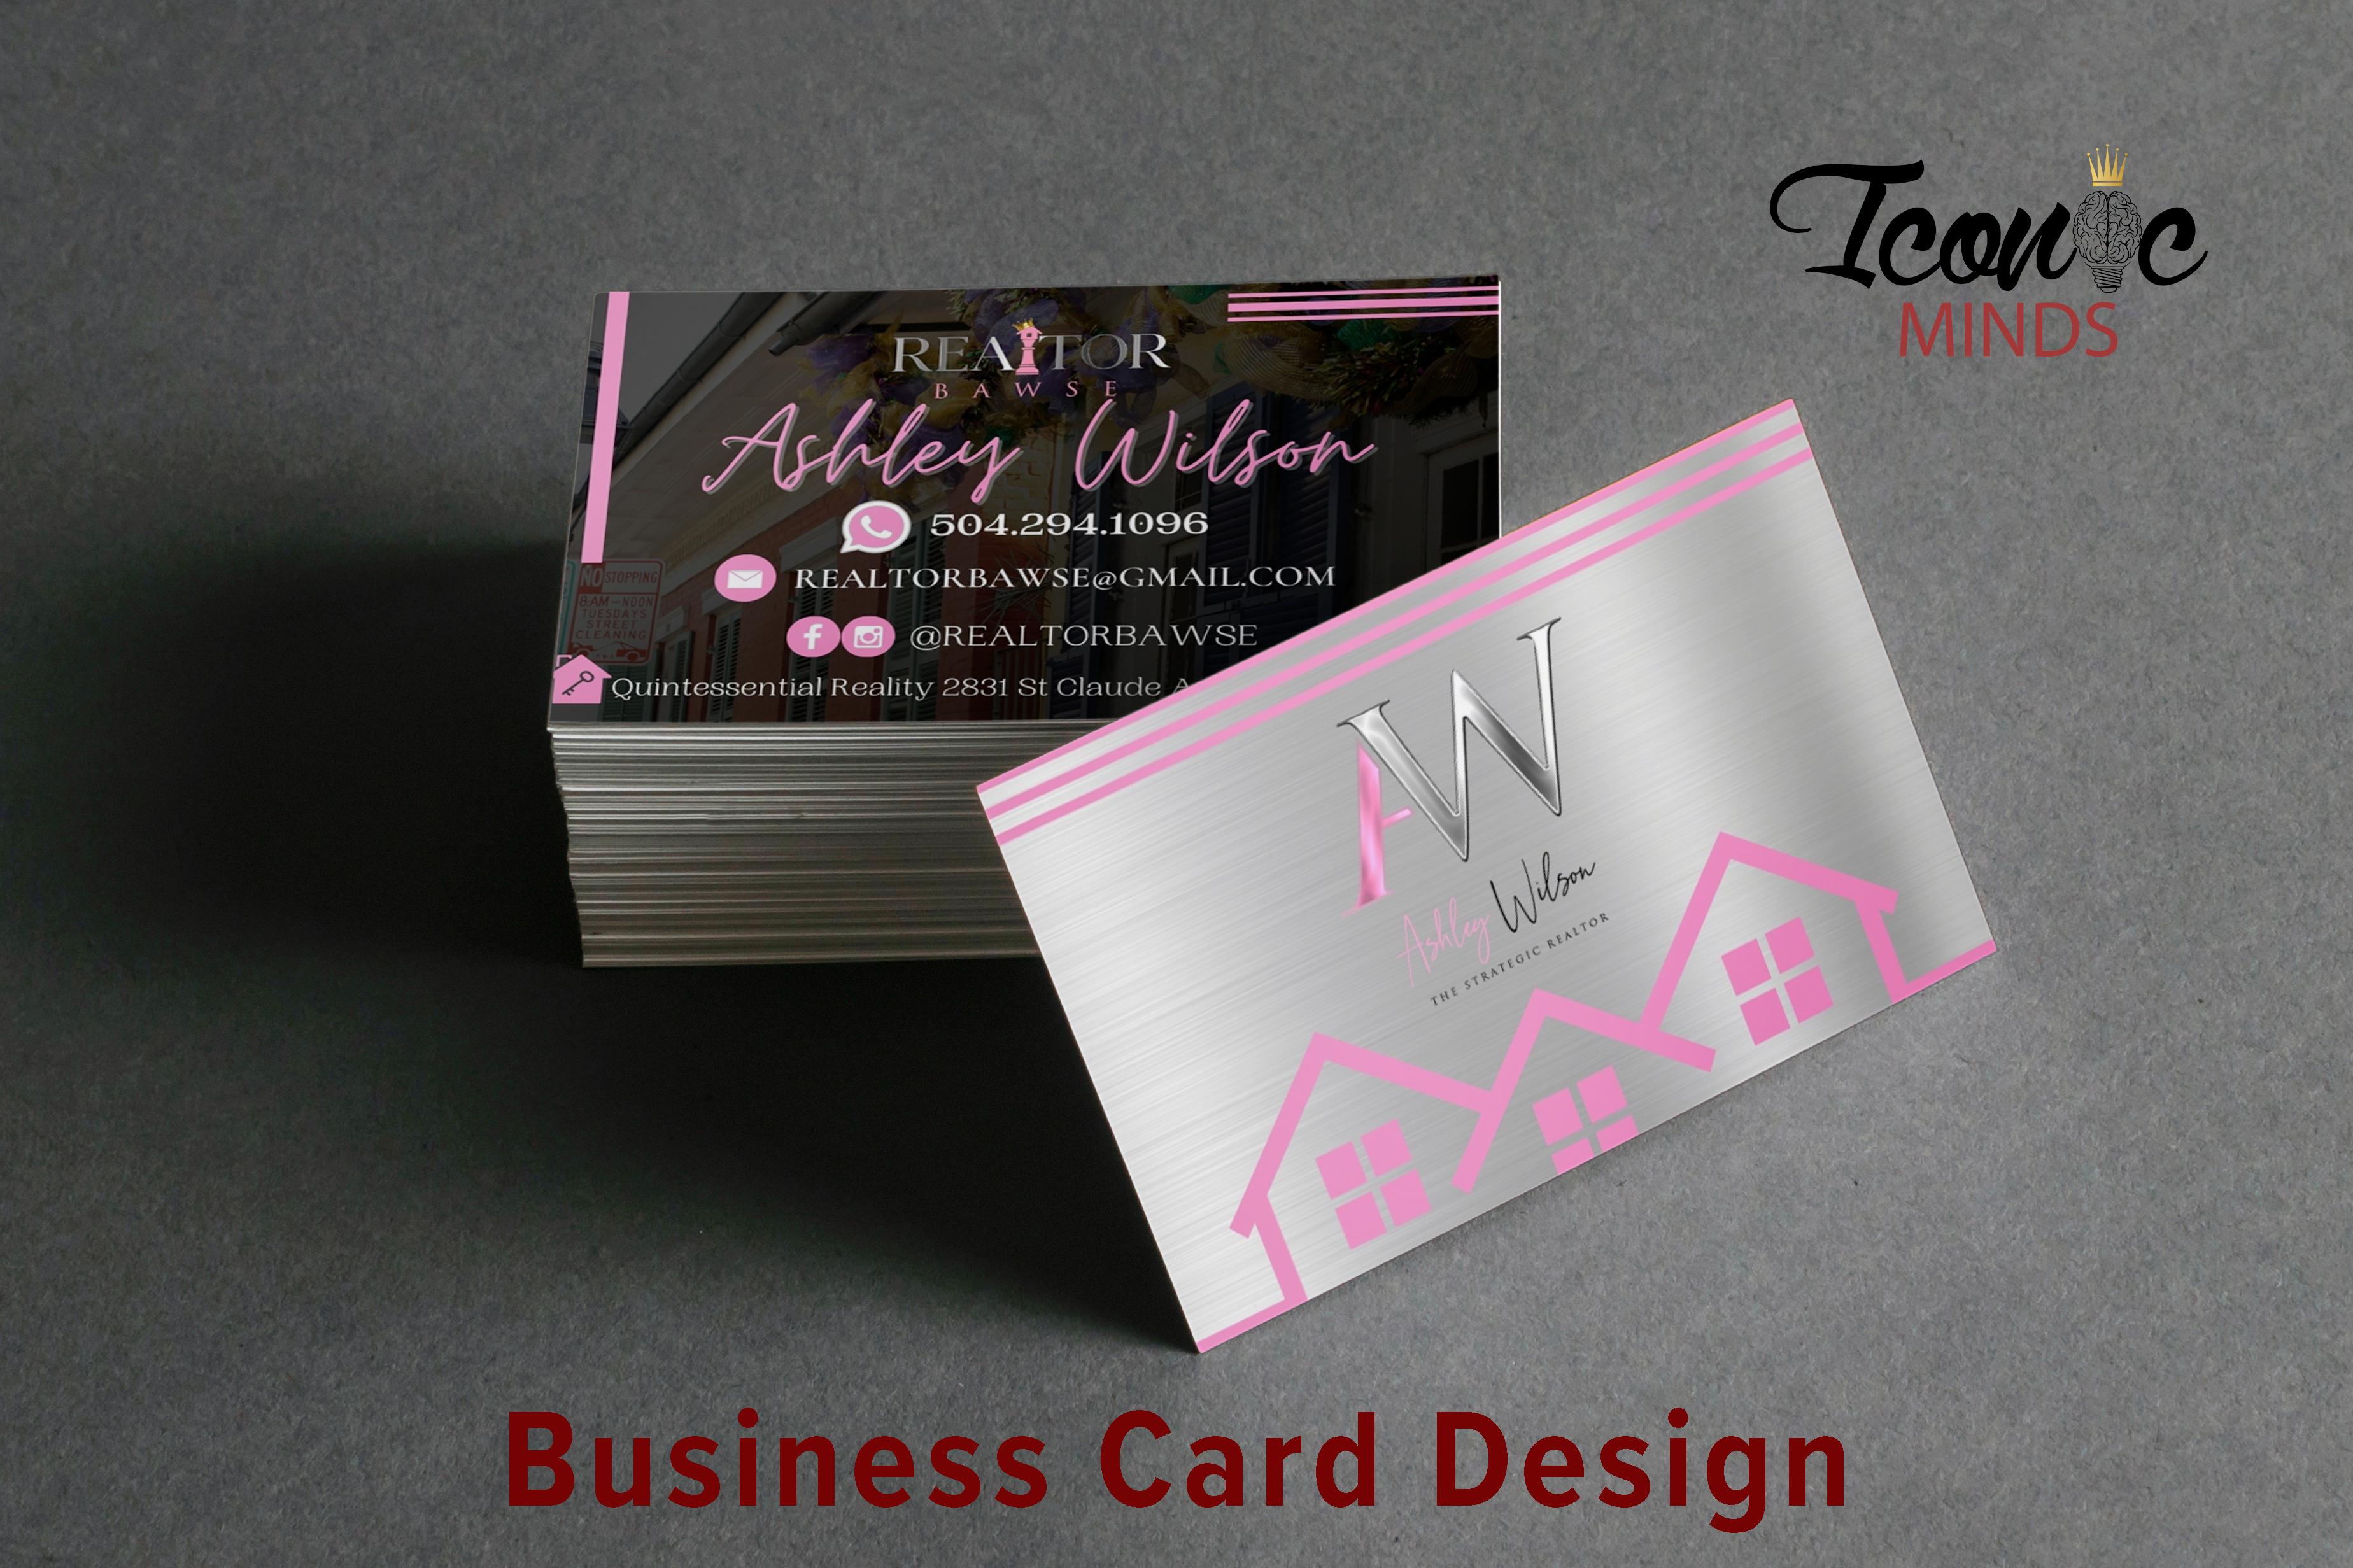 BusinessCard MockupAW